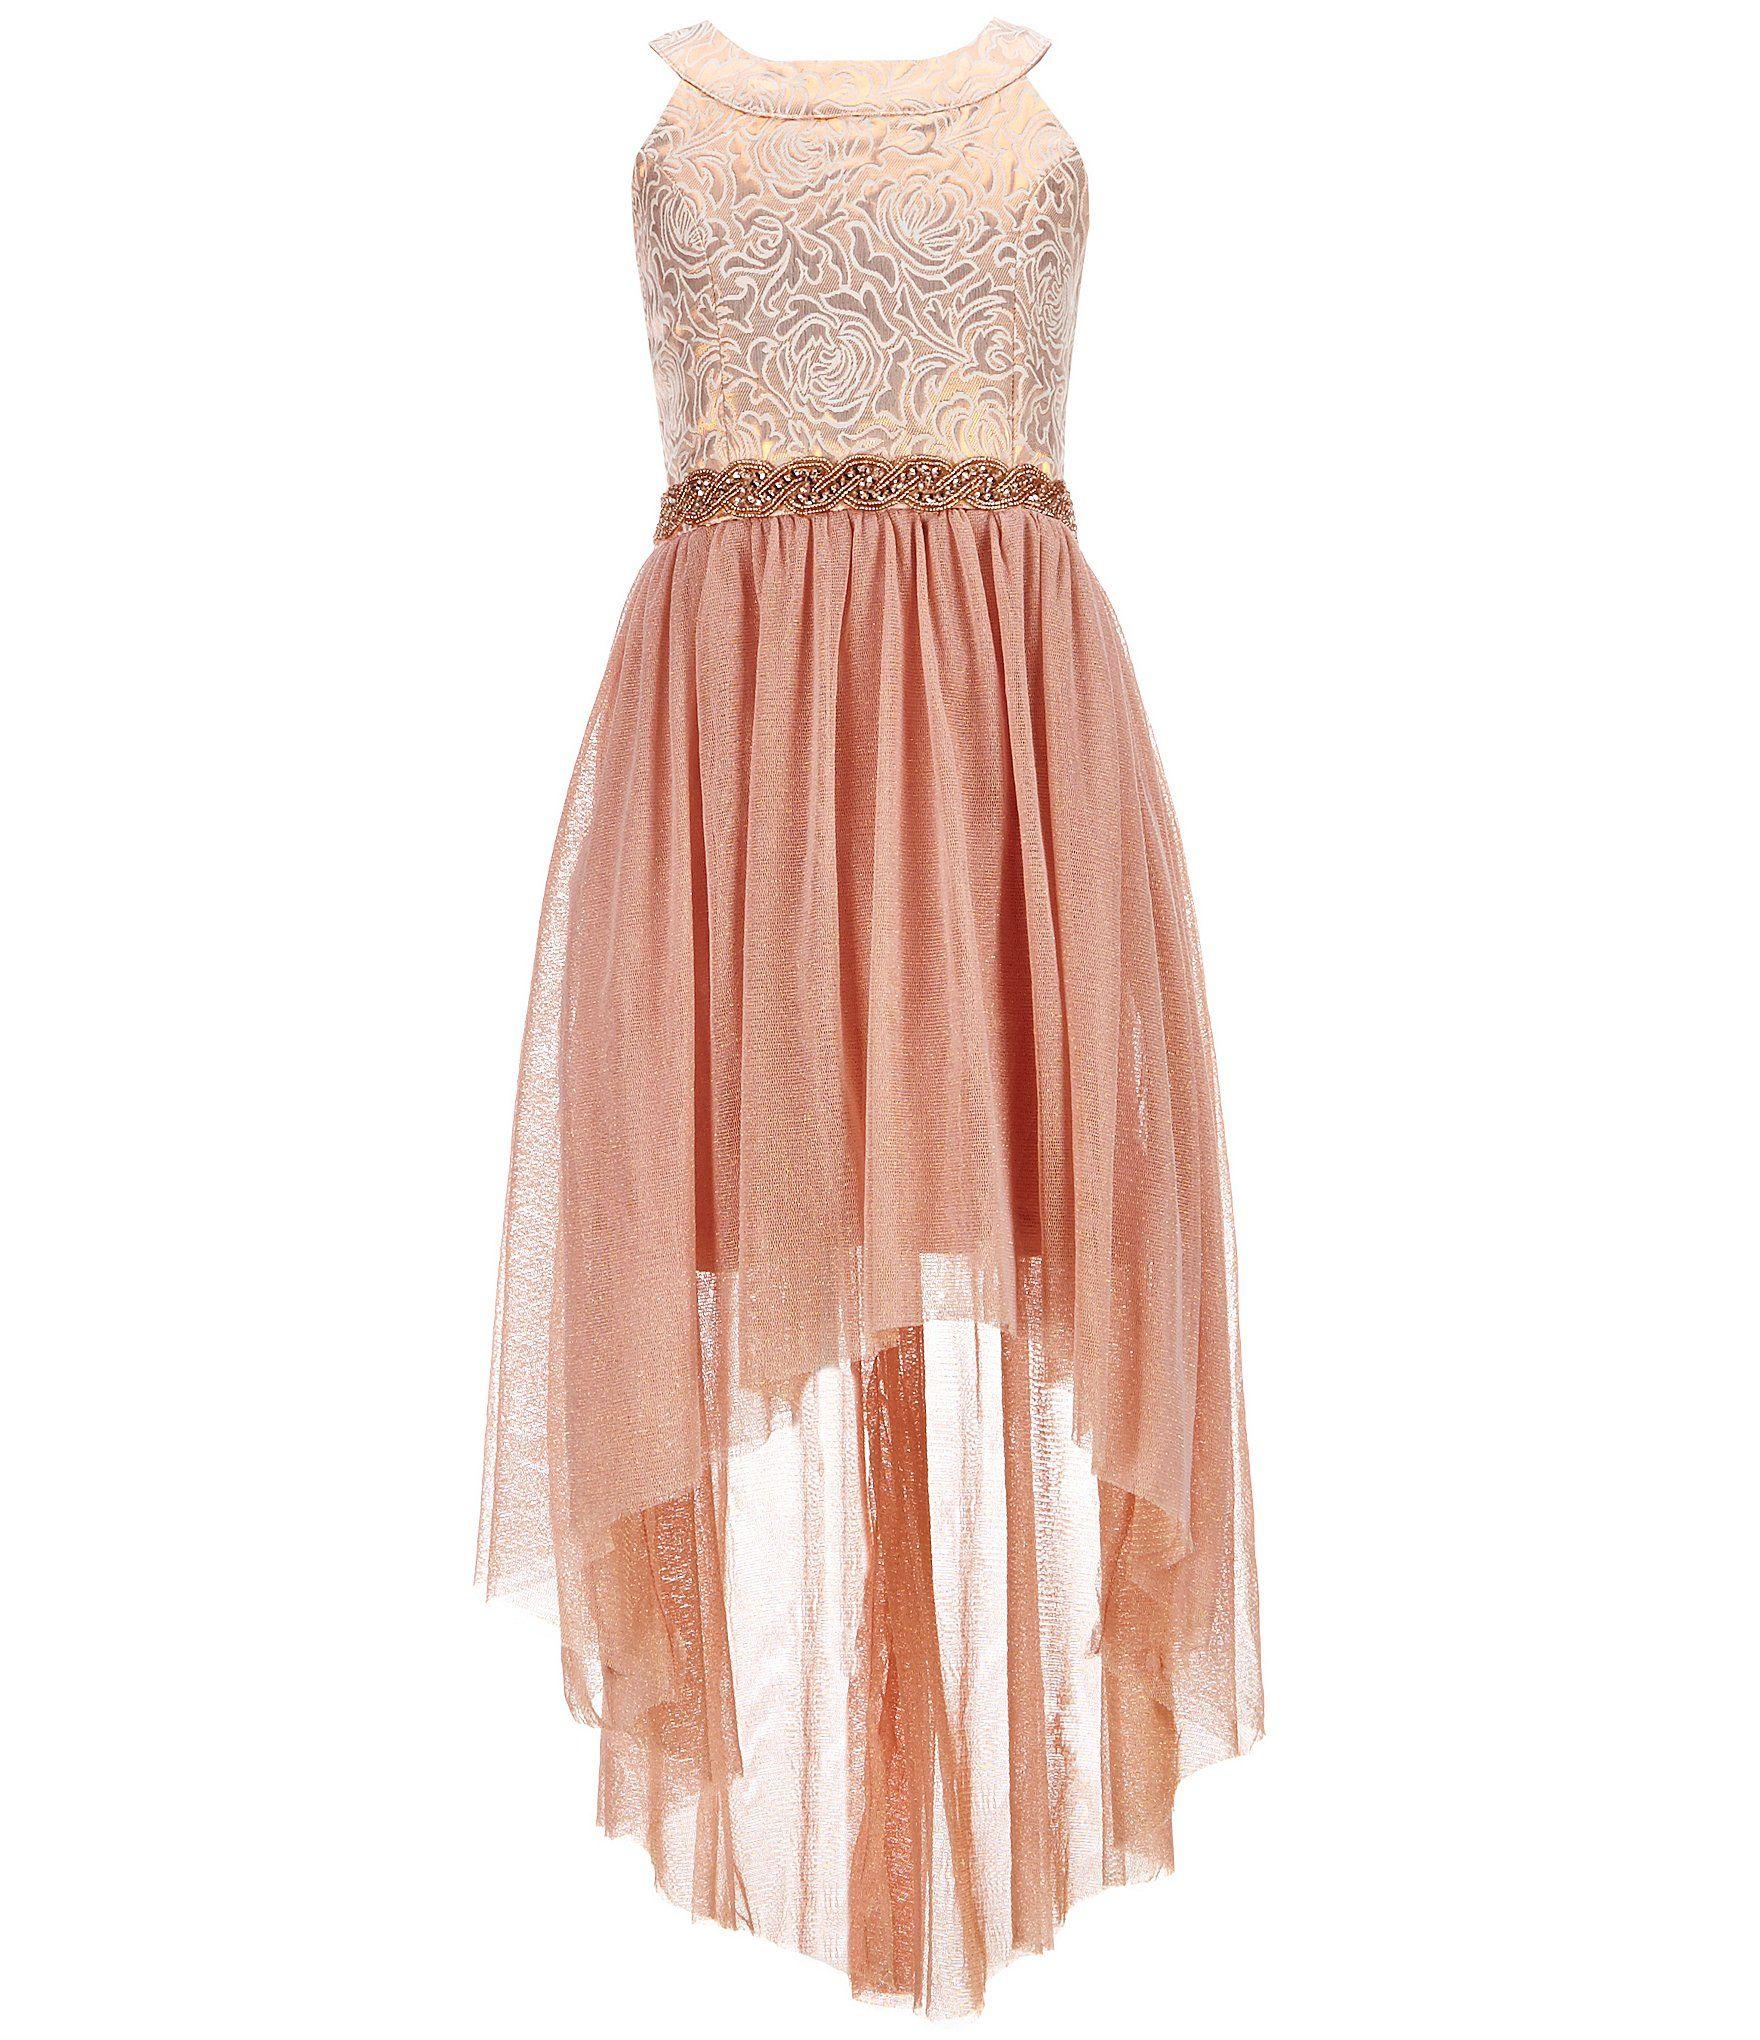 15ad9116b0 Shop for My Michelle Big Girls 7-16 Halter-Neck High-Low Dress at  Dillards.com. Visit Dillards.com to find clothing